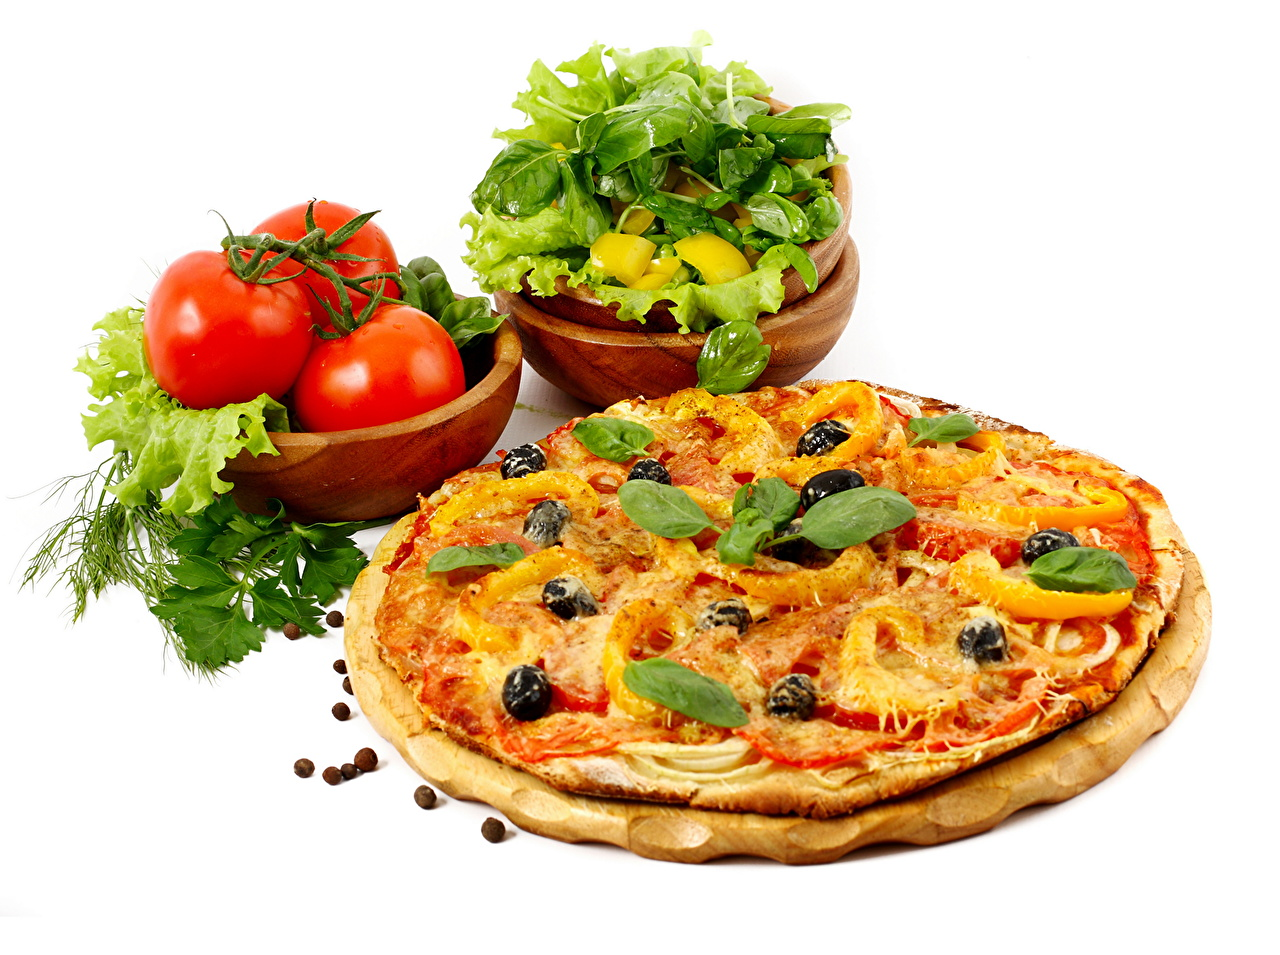 Картинка Еда Пицца Помидоры Базилик душистый Пища Продукты питания Томаты